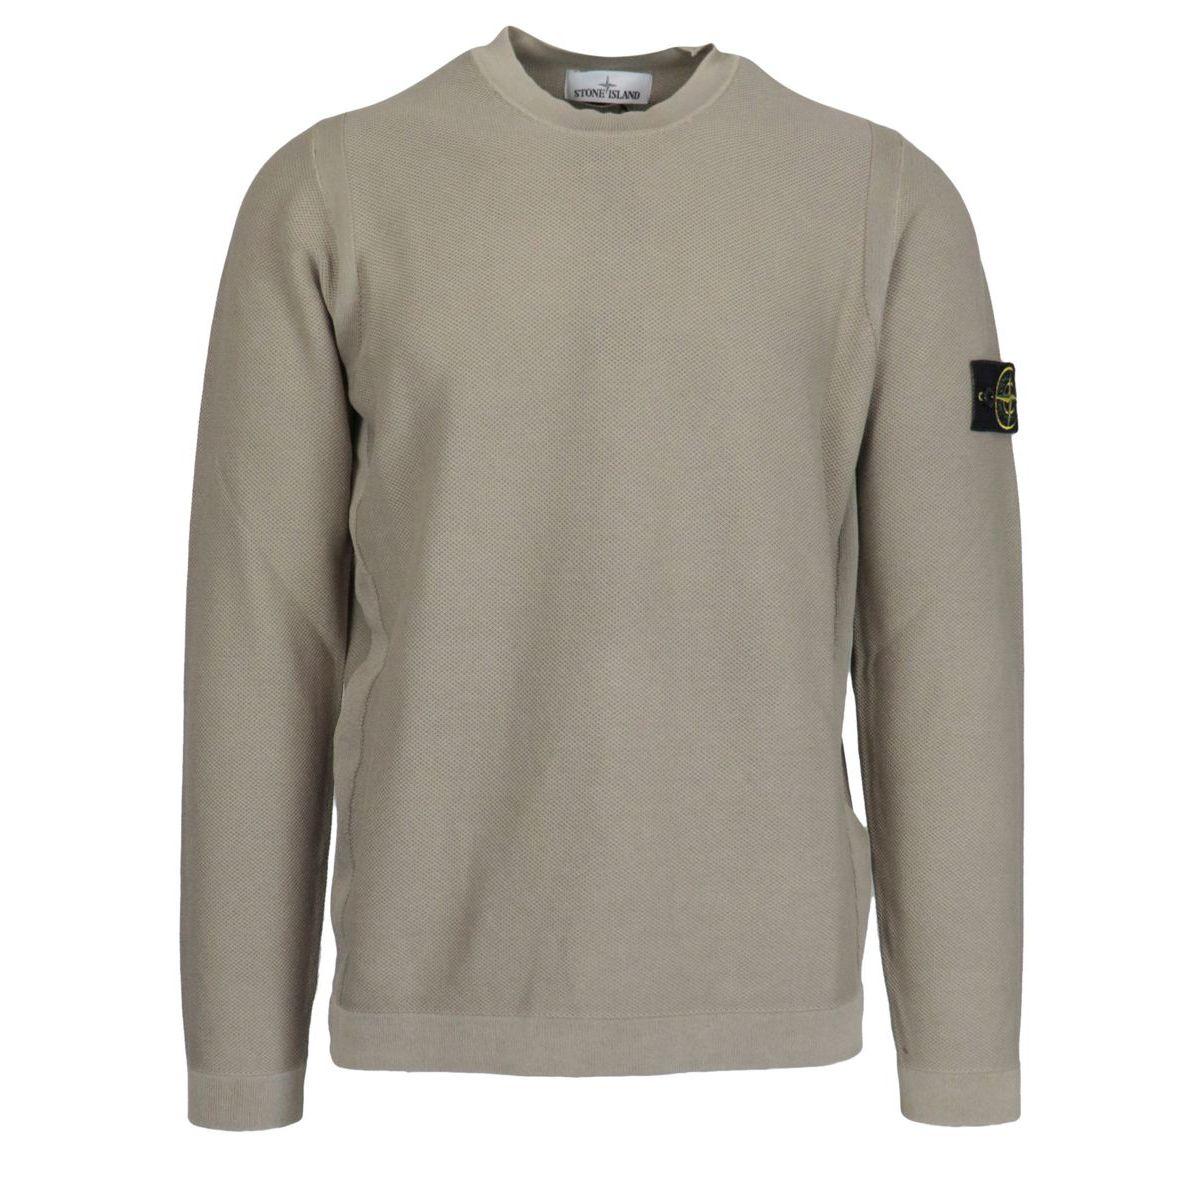 """Piquet effect"" cotton crewneck sweater with logo patch Bark Stone Island"